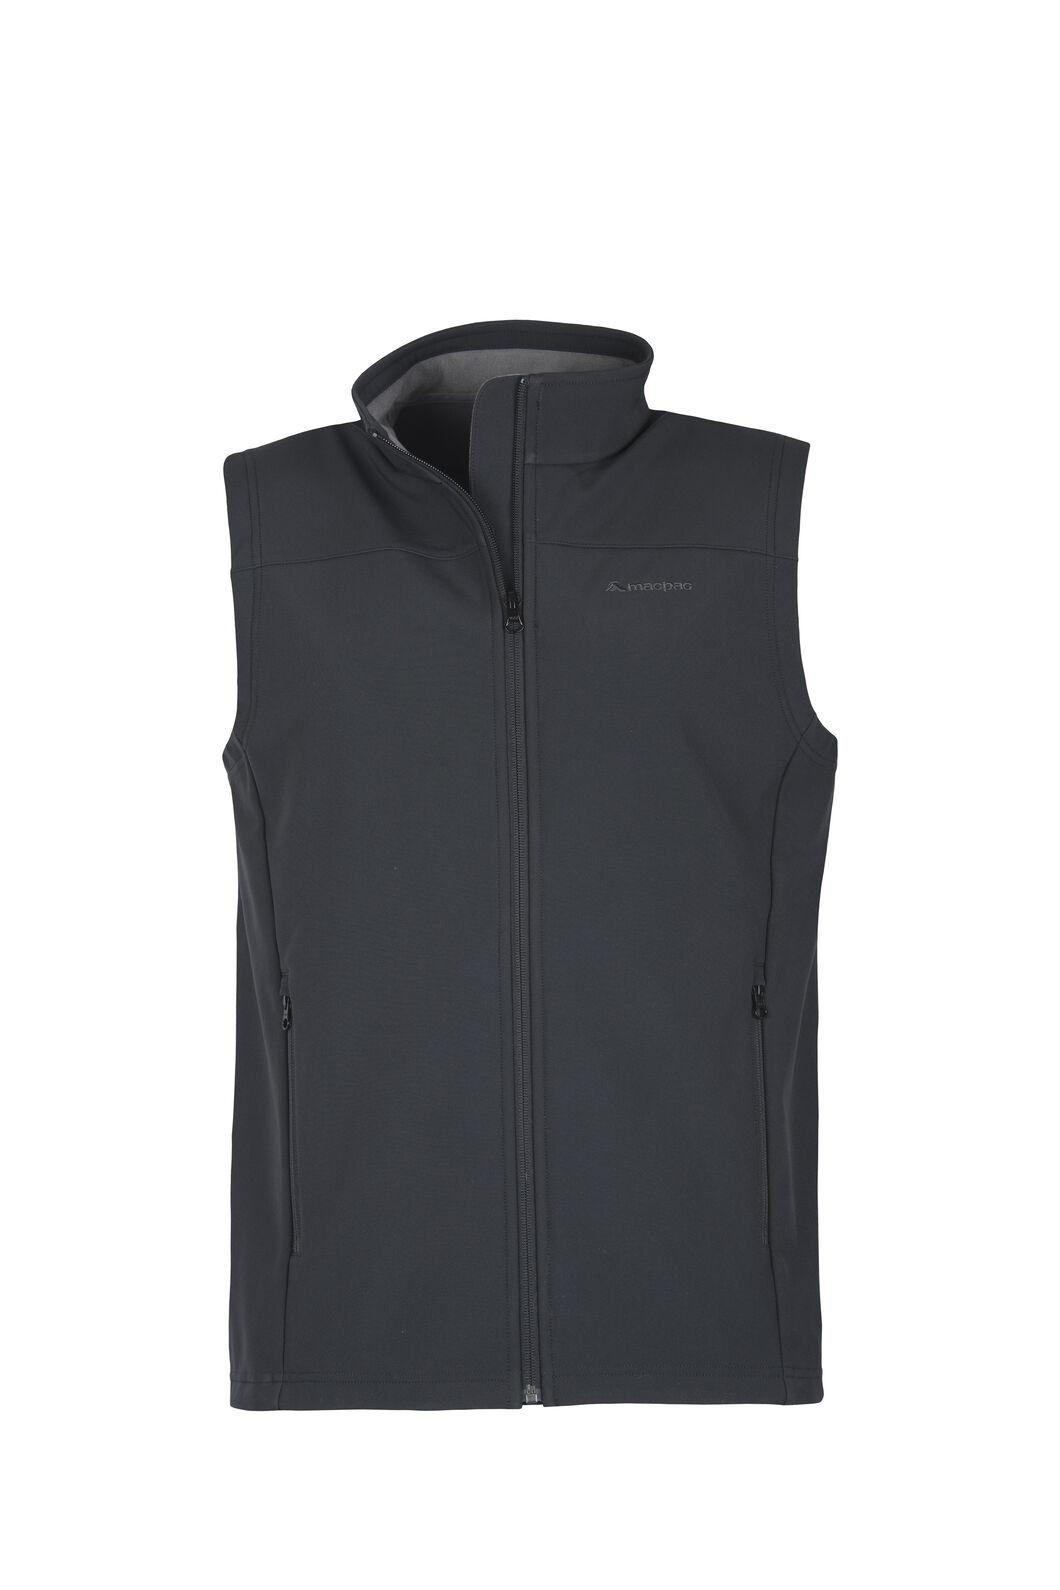 Macpac Sabre Softshell Vest - Men's, Black, hi-res